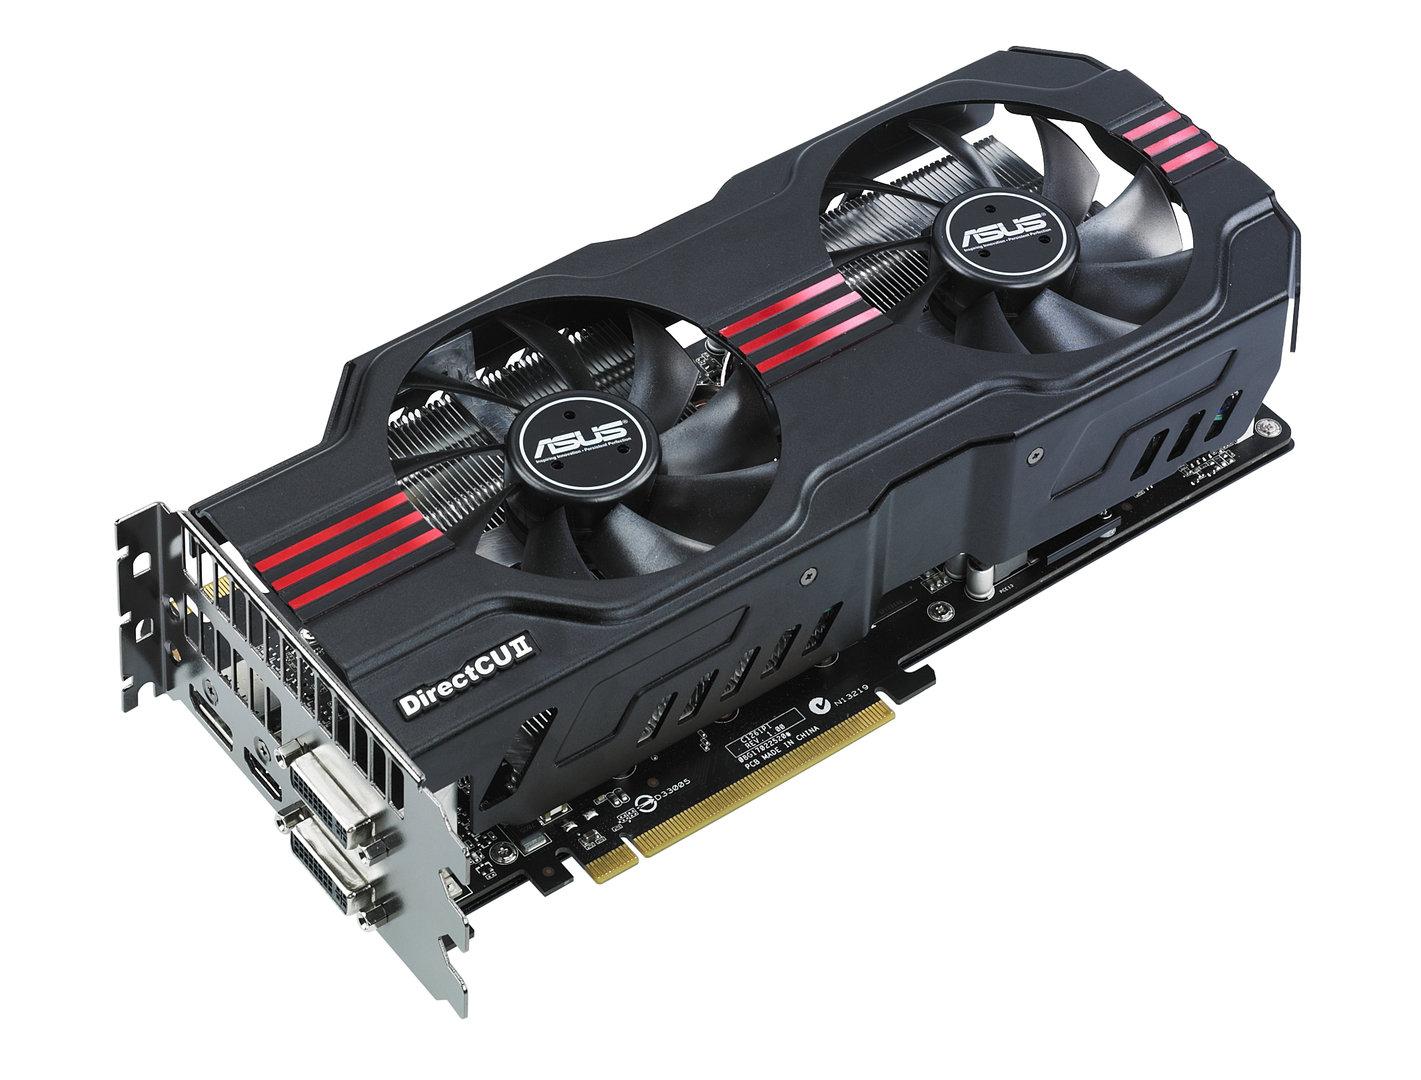 Asus GeForce GTX 560 Ti 448 DirectCU II